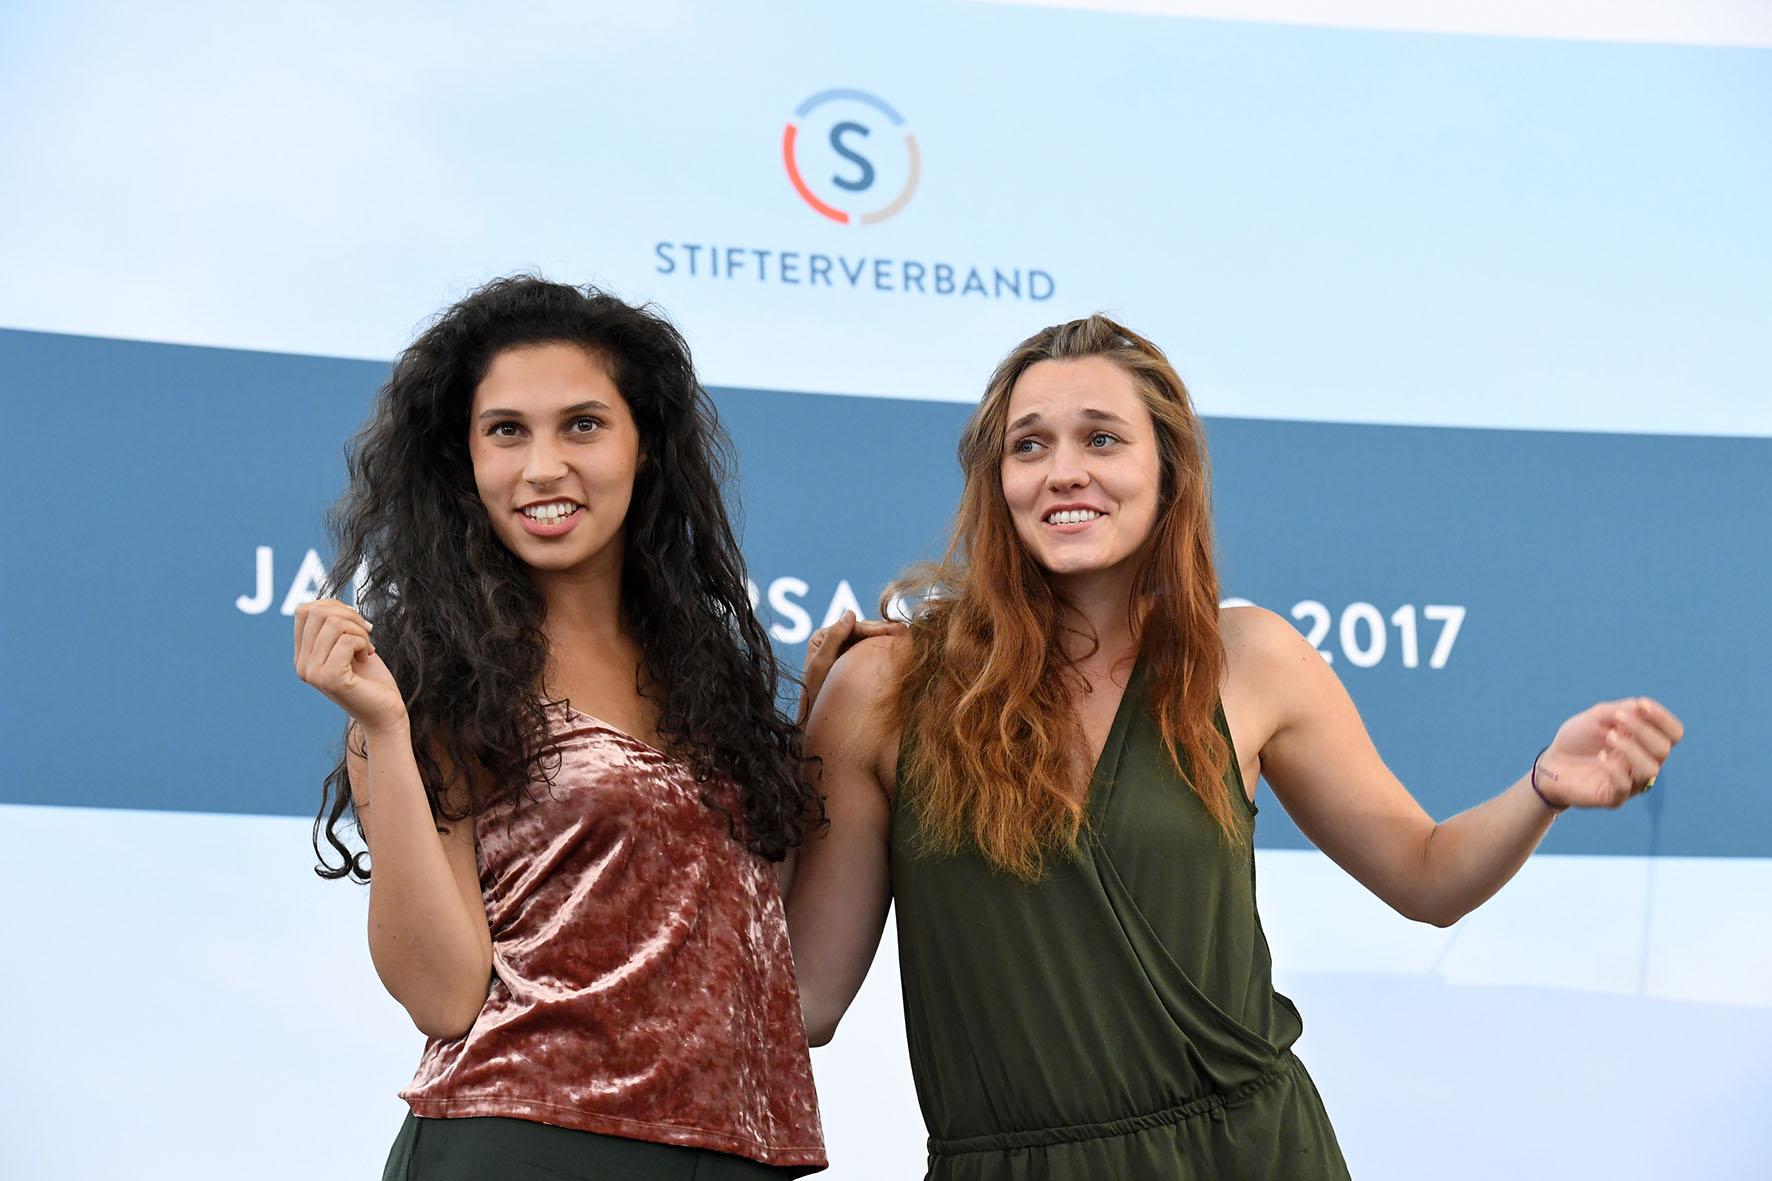 Stifterverband_2017_1366